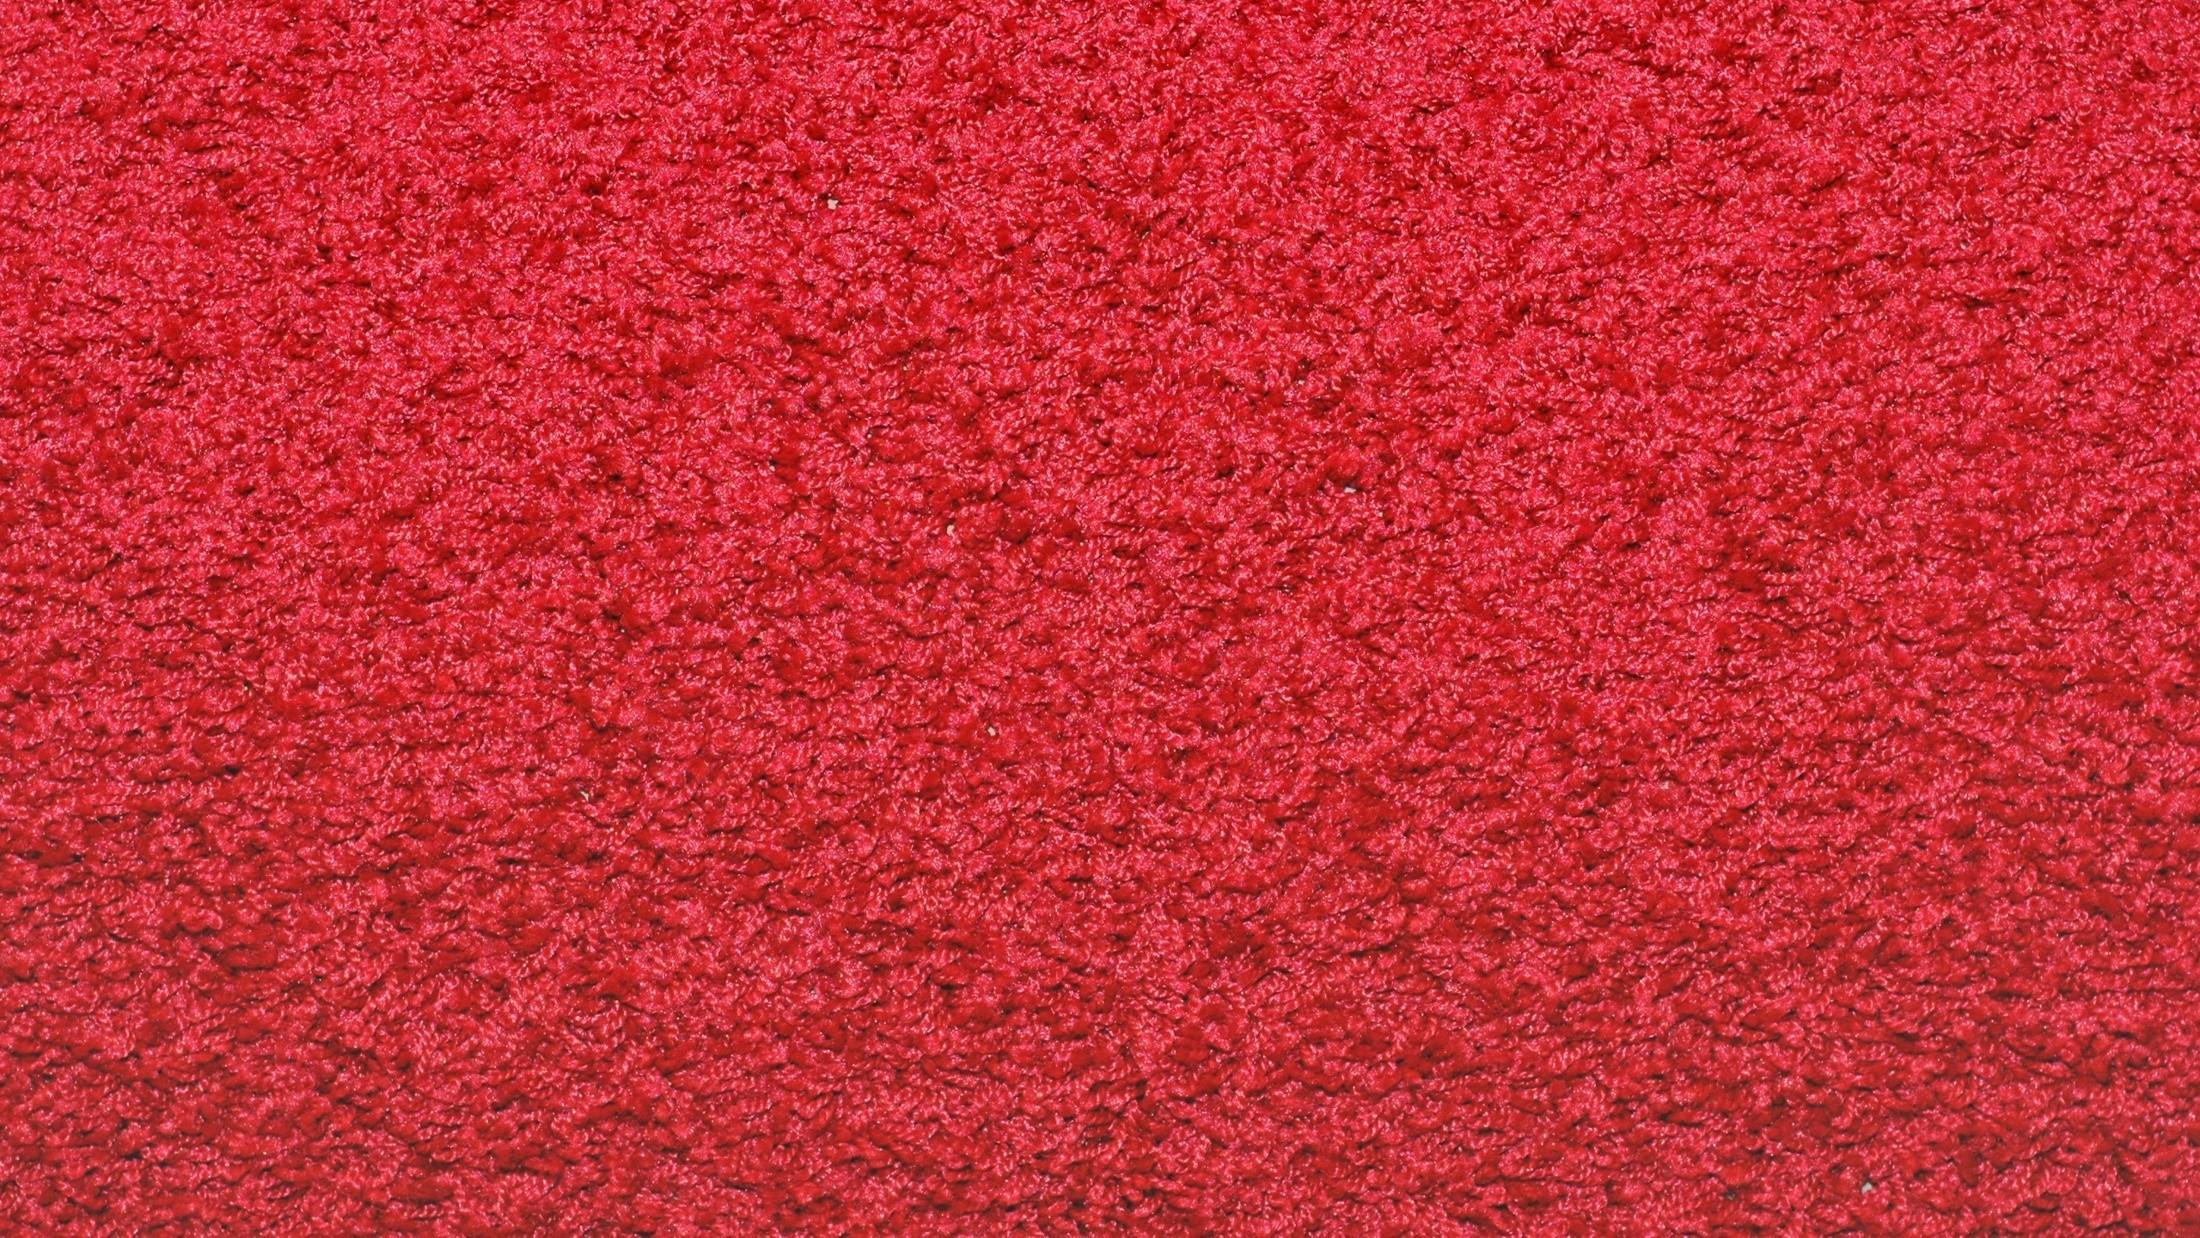 Wallpaper : nature, red, pattern, texture, carpet, flower ...  Red Carpet Texture Pattern